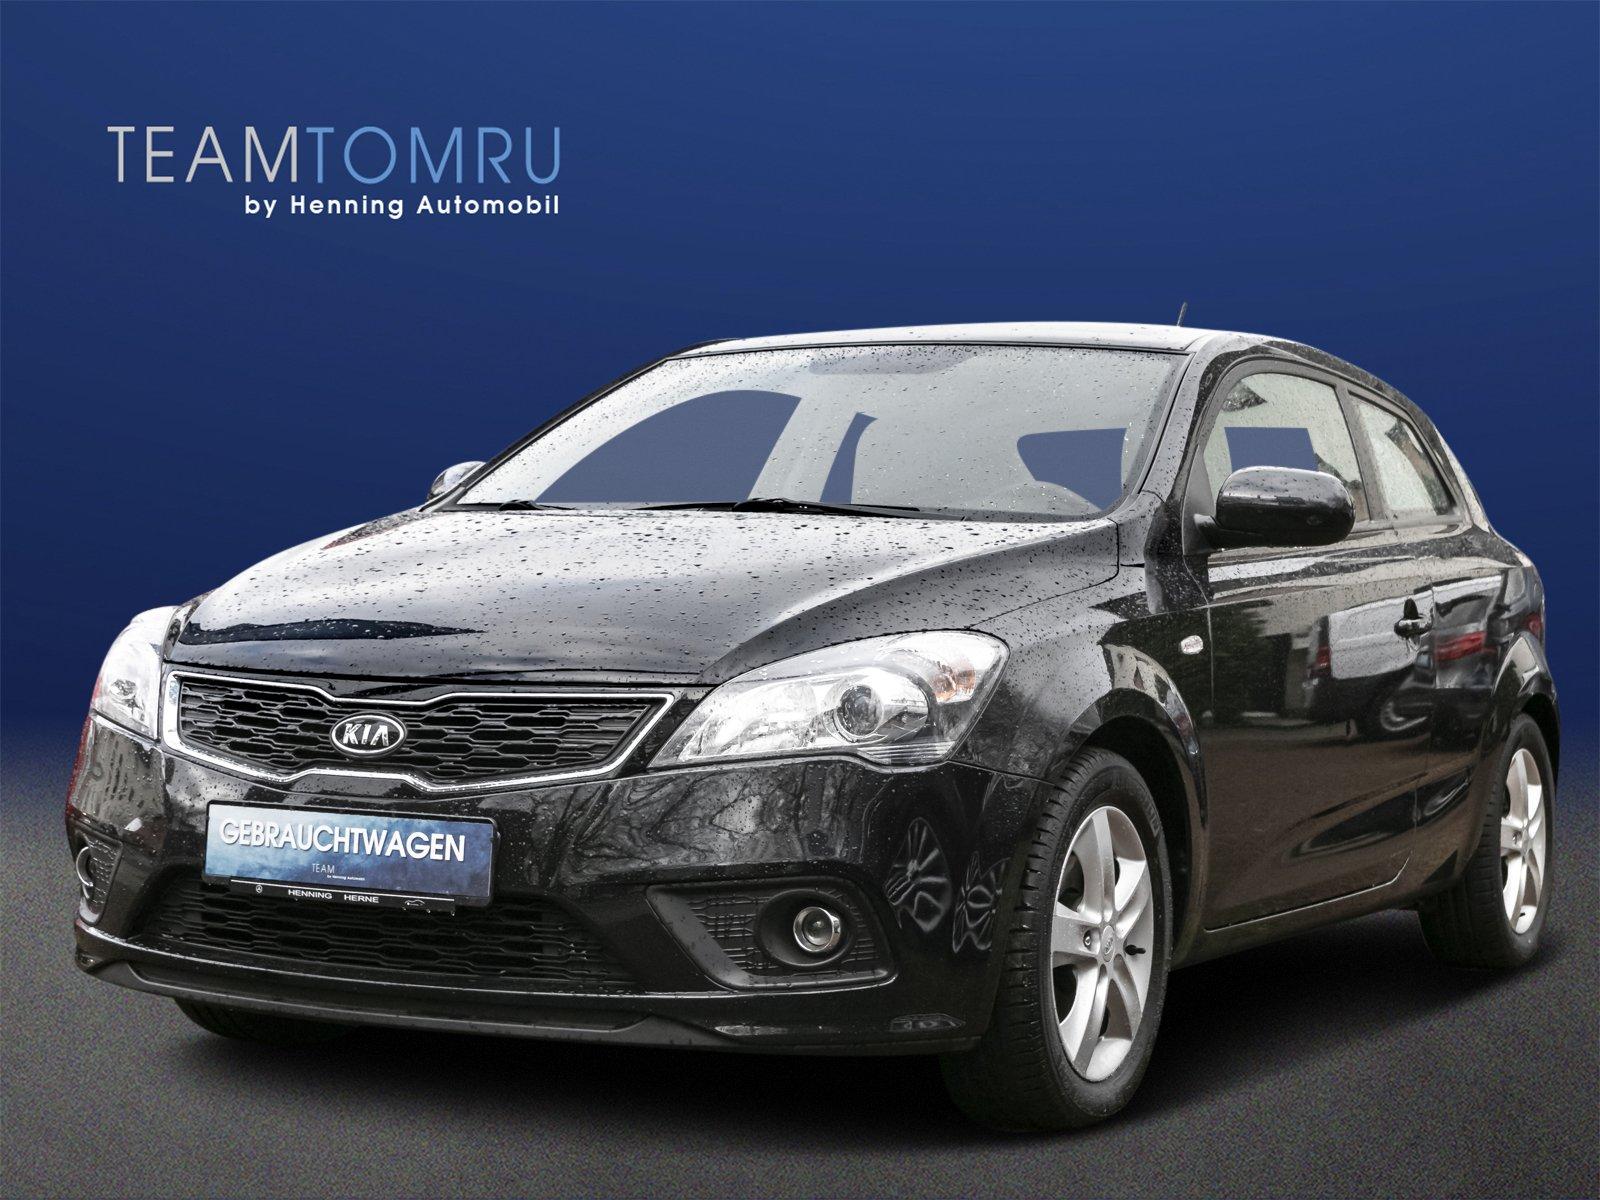 Kia Kia cee'd 1.4 CVVT Edition 7-Klima-Navi-R.Kamara, Jahr 2013, Benzin